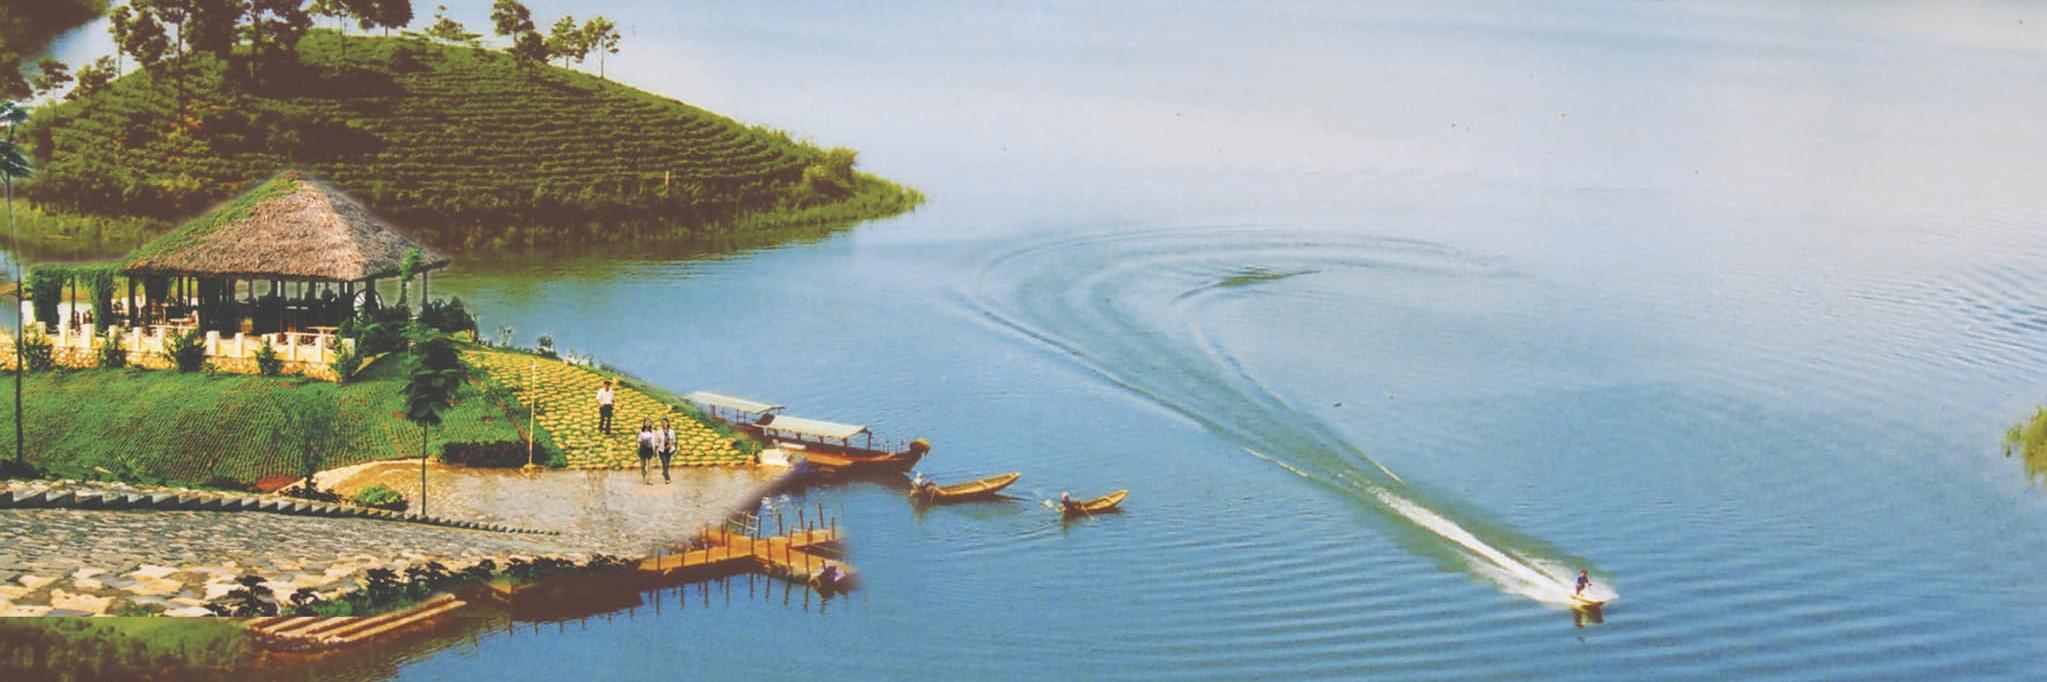 https://gody.vn/blog/baaroochan5562/post/check-in-3-vinh-ha-long-tren-can-dep-bac-nhat-viet-nam-8356